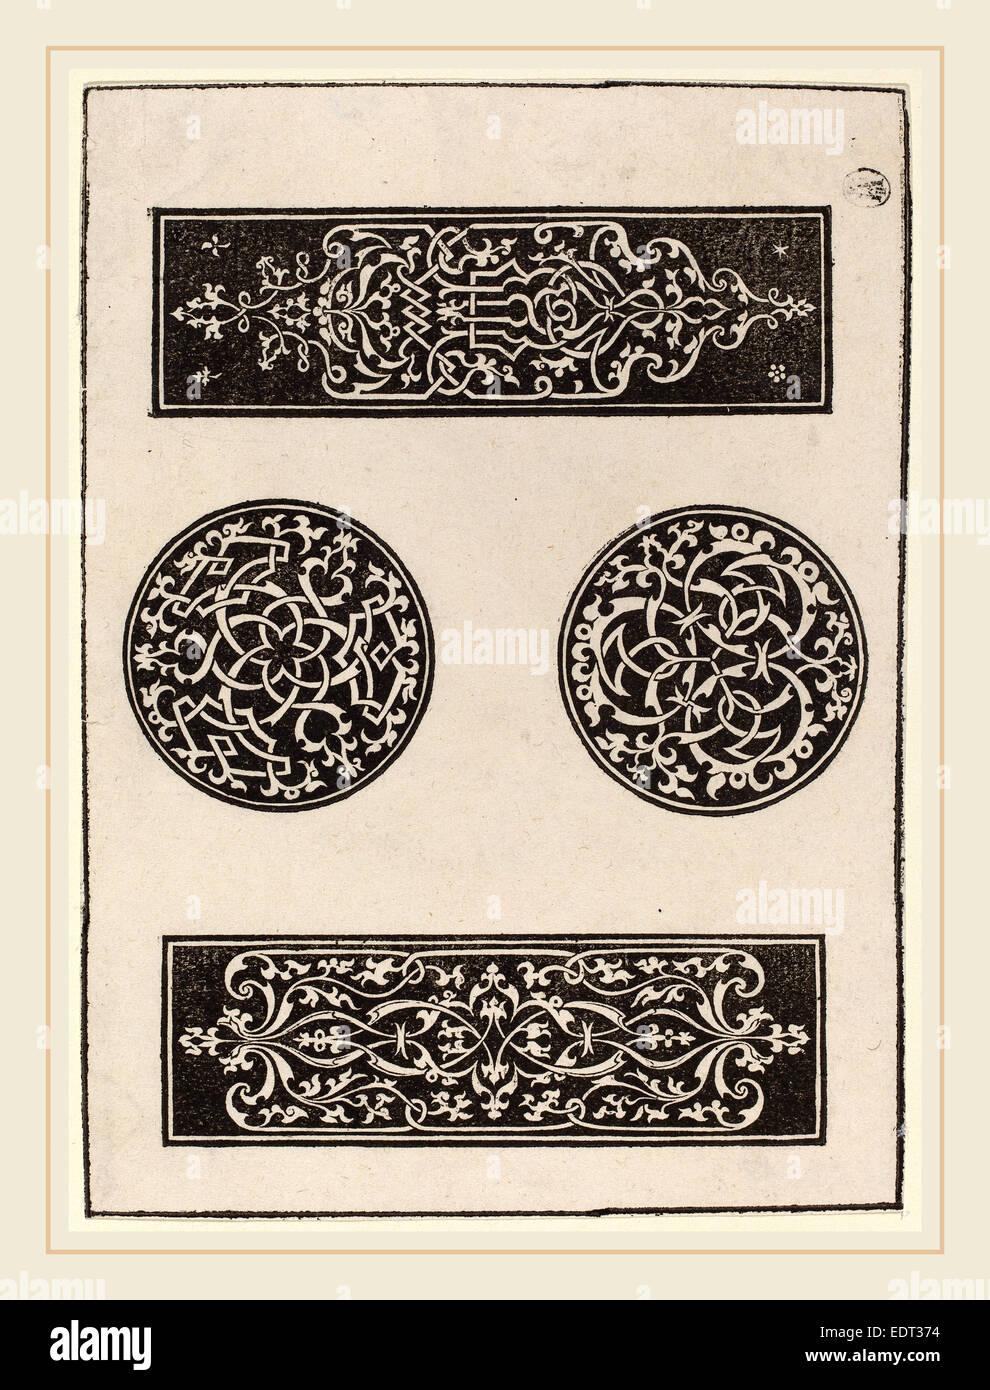 Peter Flötner, paneles decorativos, Alemán, c. 1485-1546, xilografía, 1546 Imagen De Stock